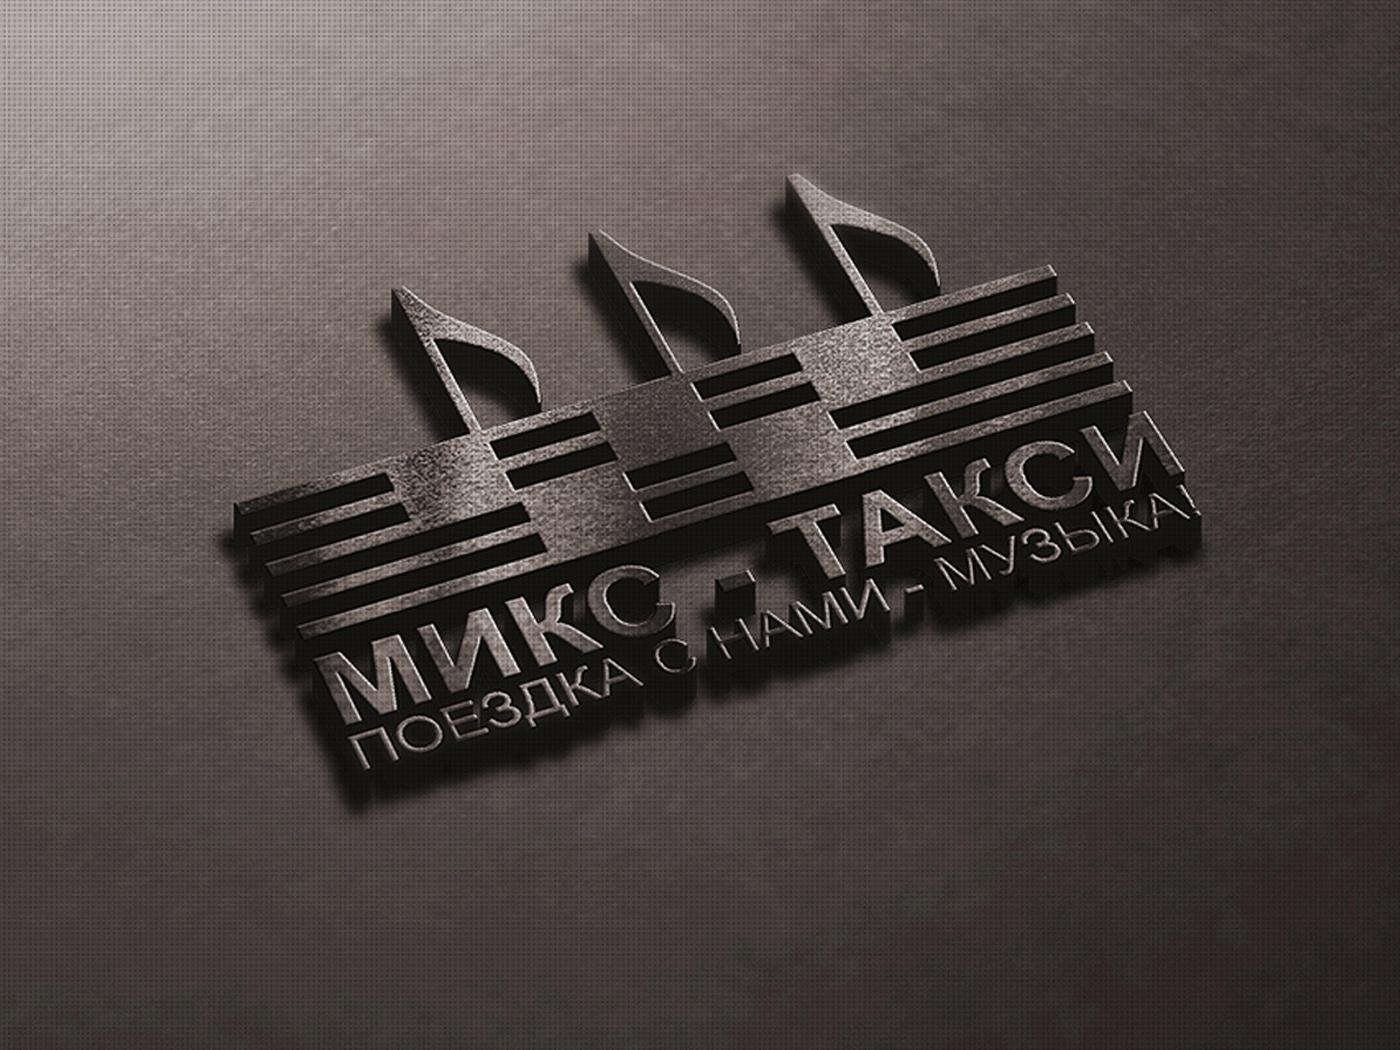 Разработка логотипа, фирменного стиля